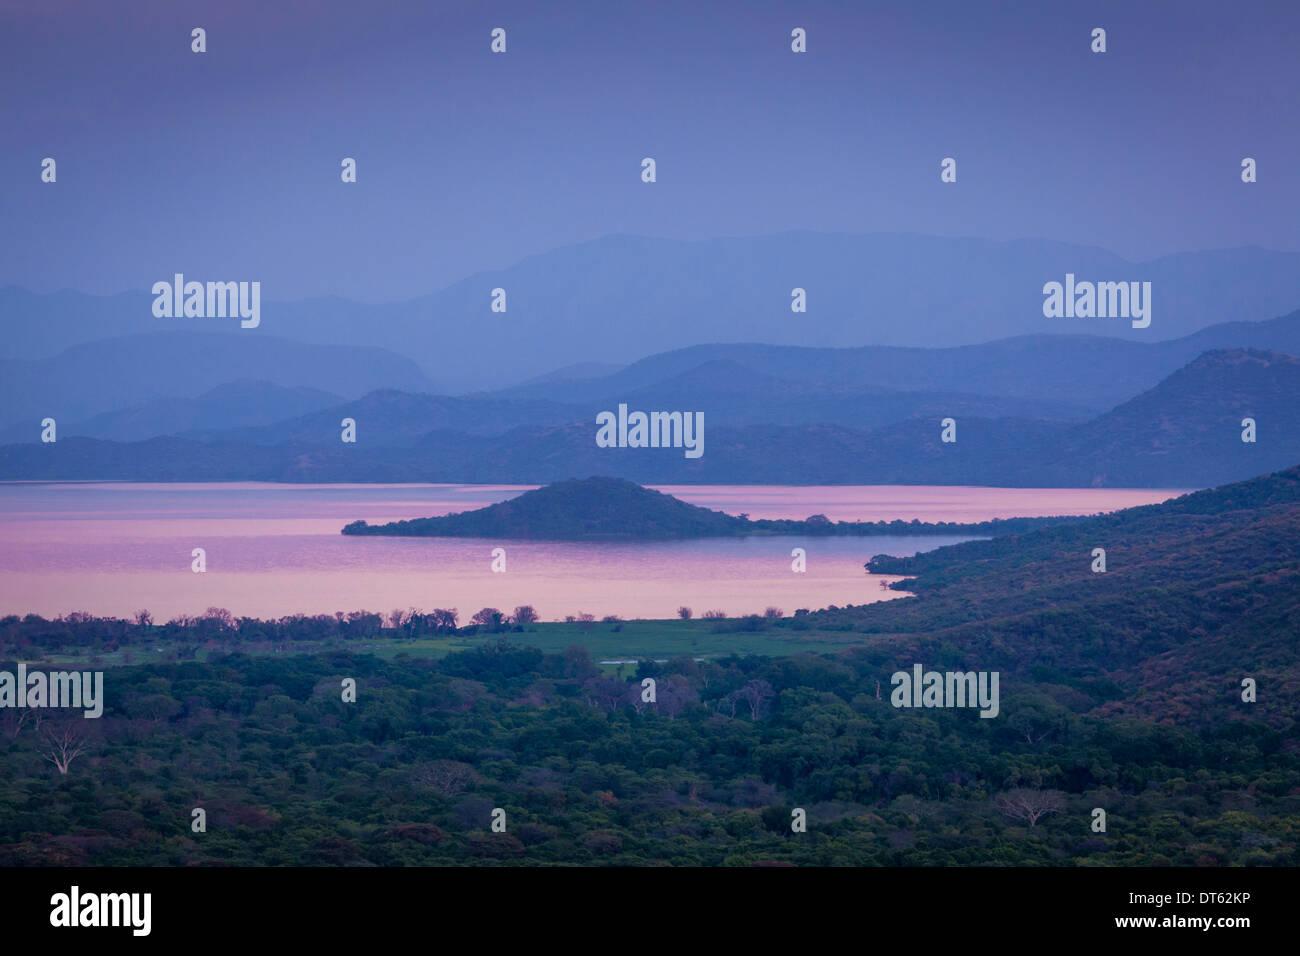 Lake Abaya and Views Towards Nechisar National Park, Arba Minch, Ethiopia Stock Photo